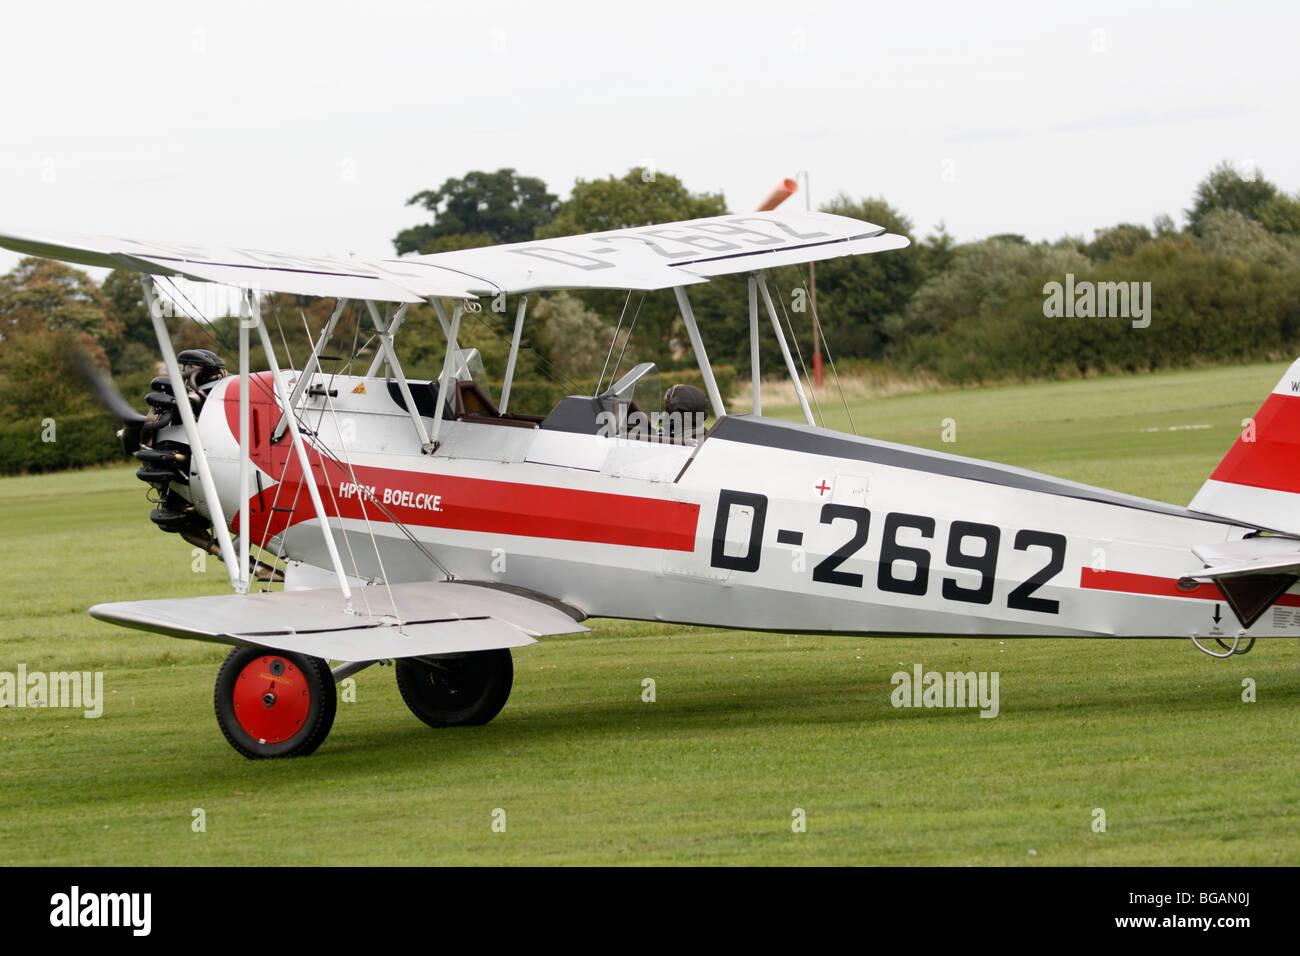 Focke-Wulf Fw.44J Stieglitz, G-STIG / D-2692. Goldfinch. Two seat trainer biplane. Siemens-Halske Sh 14 radial engine - Stock Image